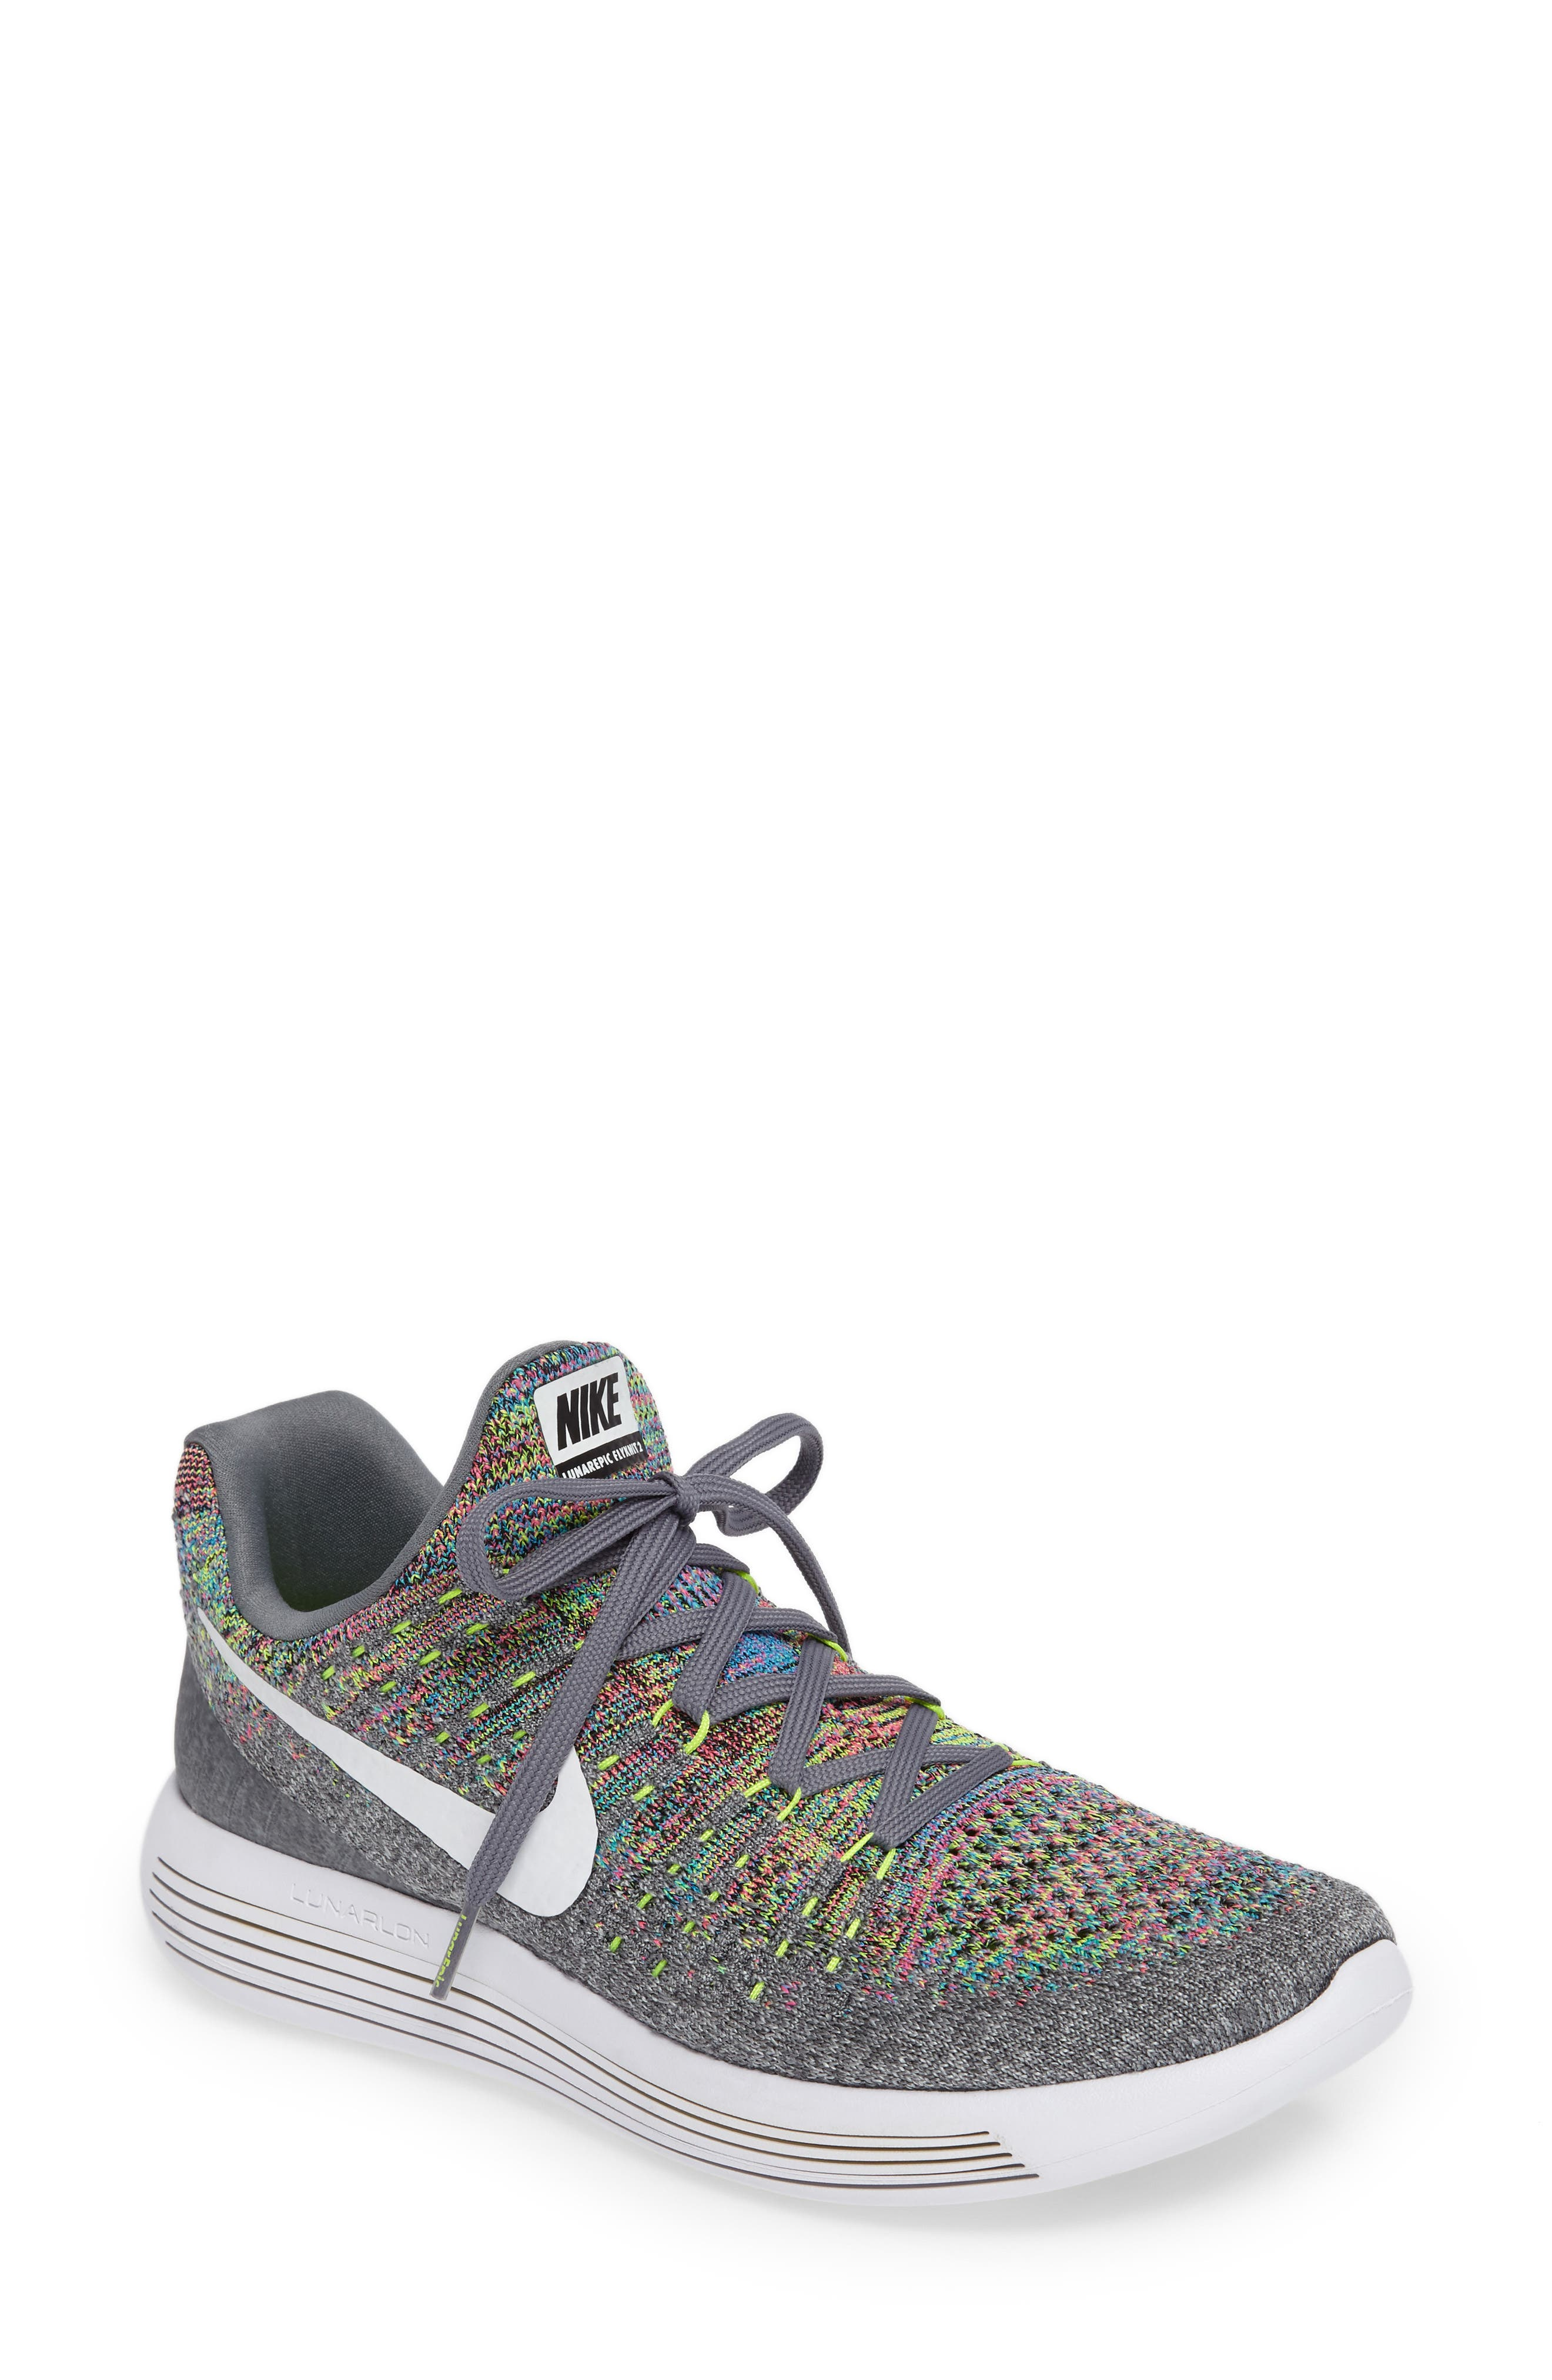 LunarEpic Low Flyknit 2 Running Shoe,                             Main thumbnail 8, color,